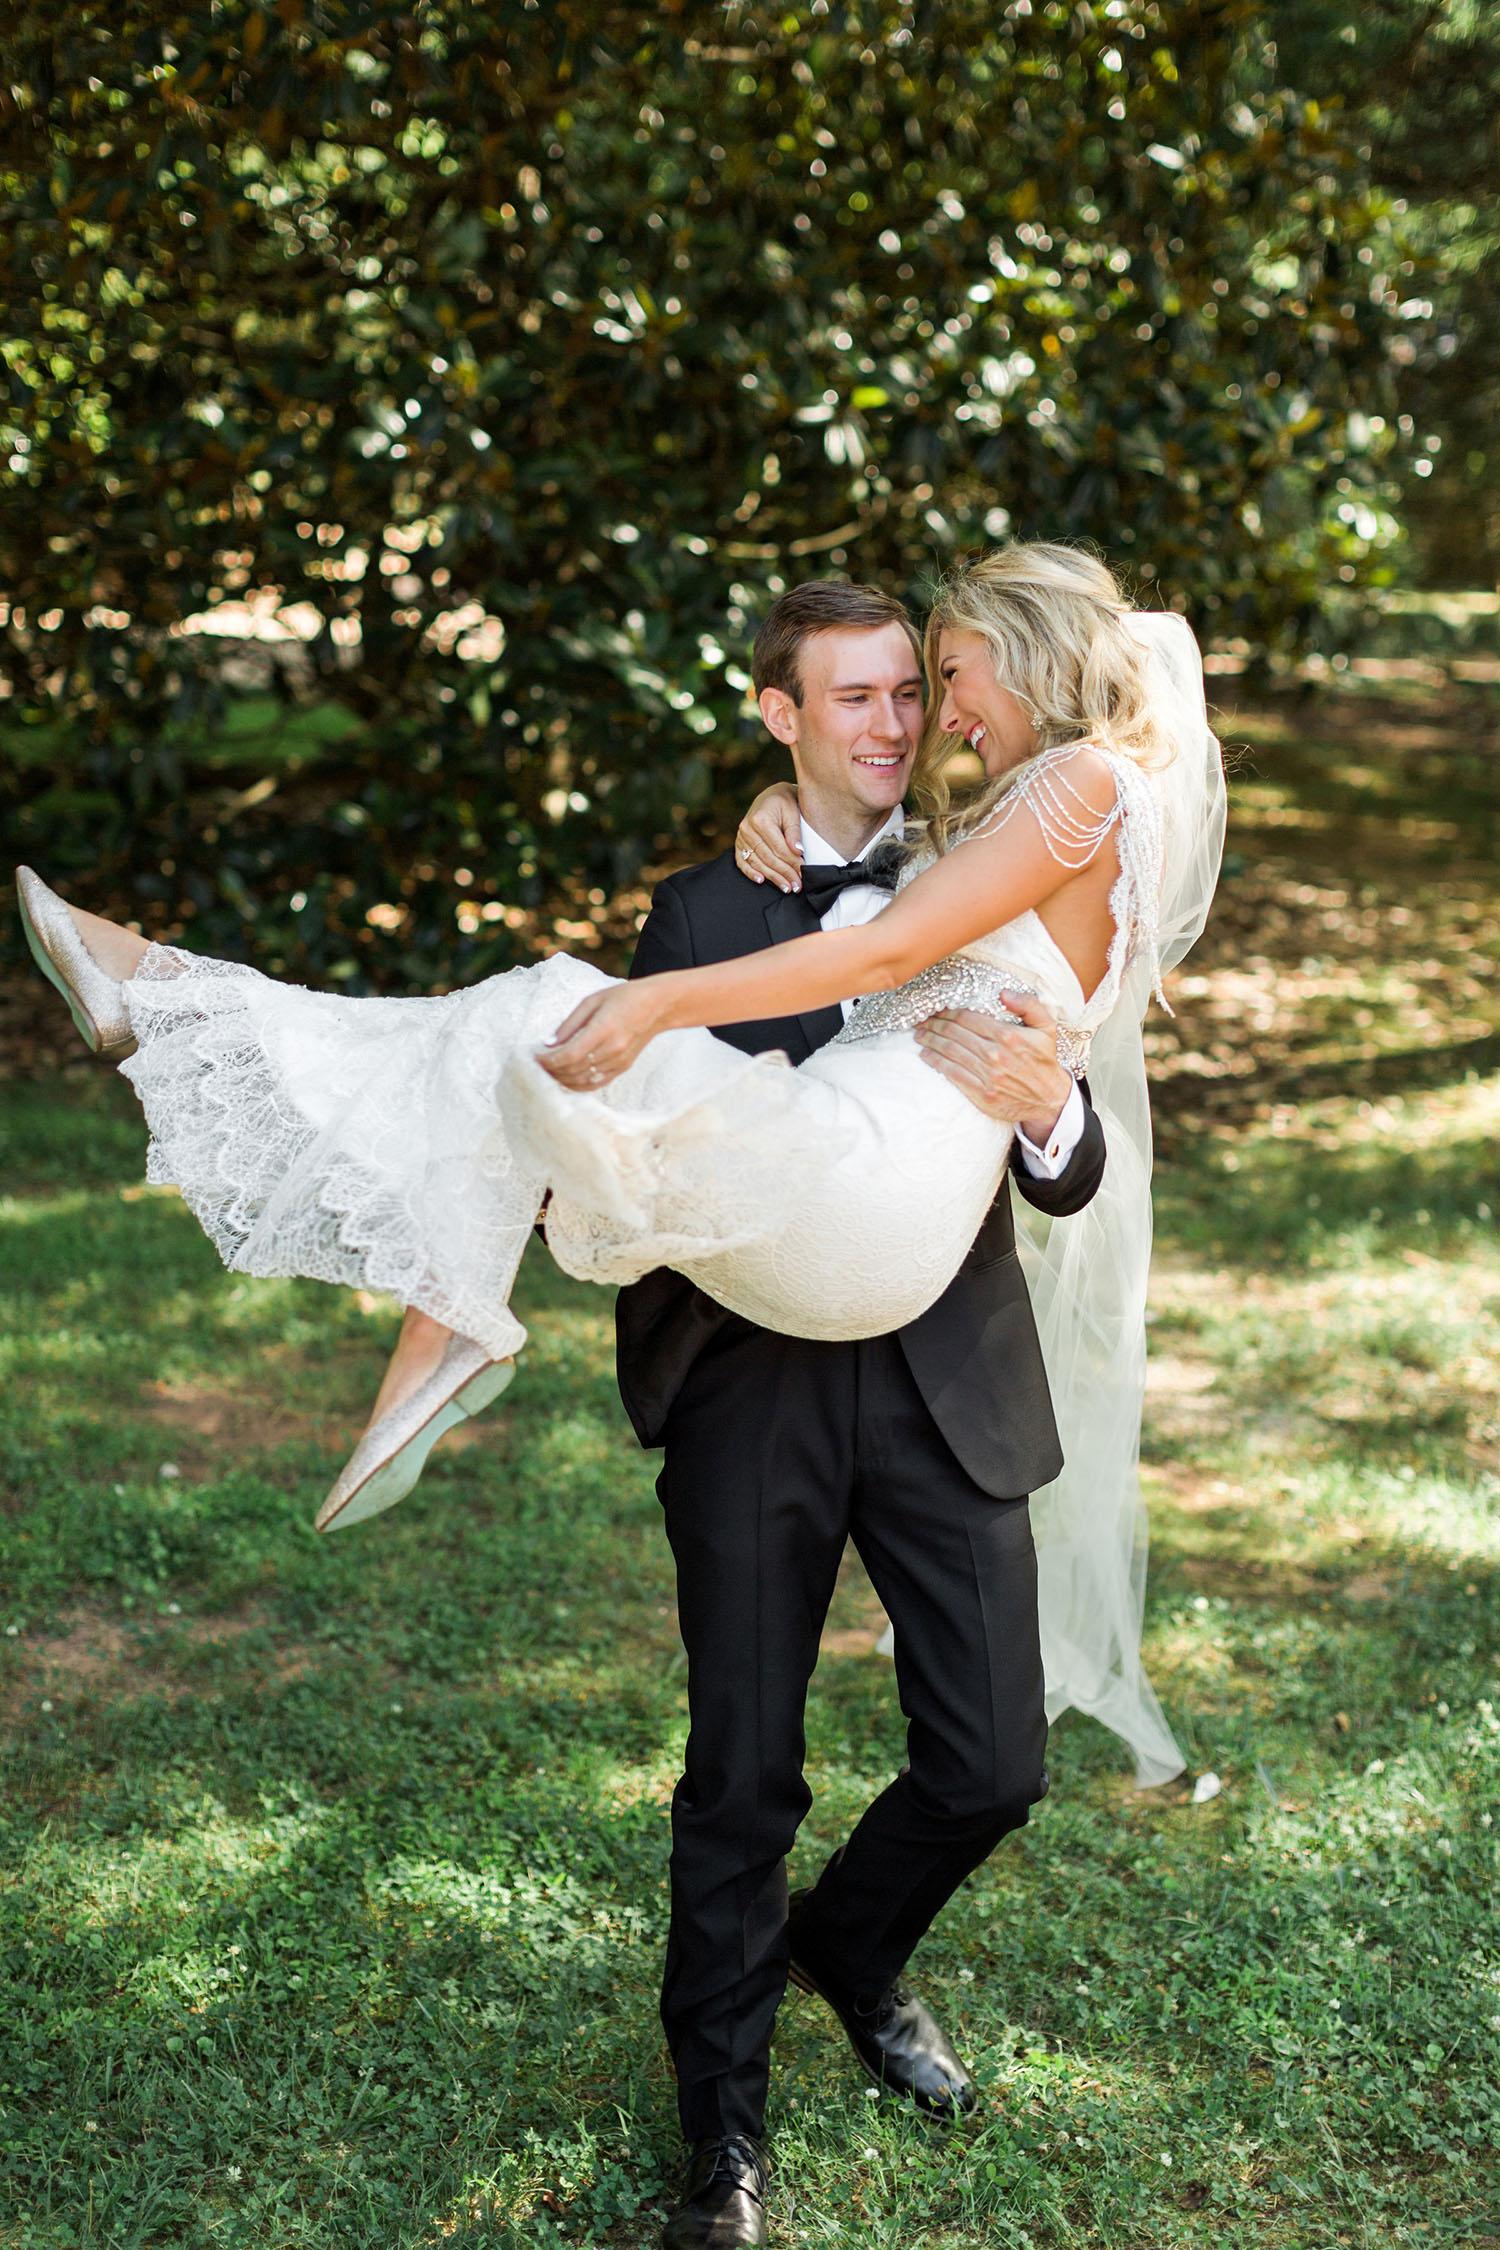 Brittany&WesWedding_RusticWhite_243.jpg